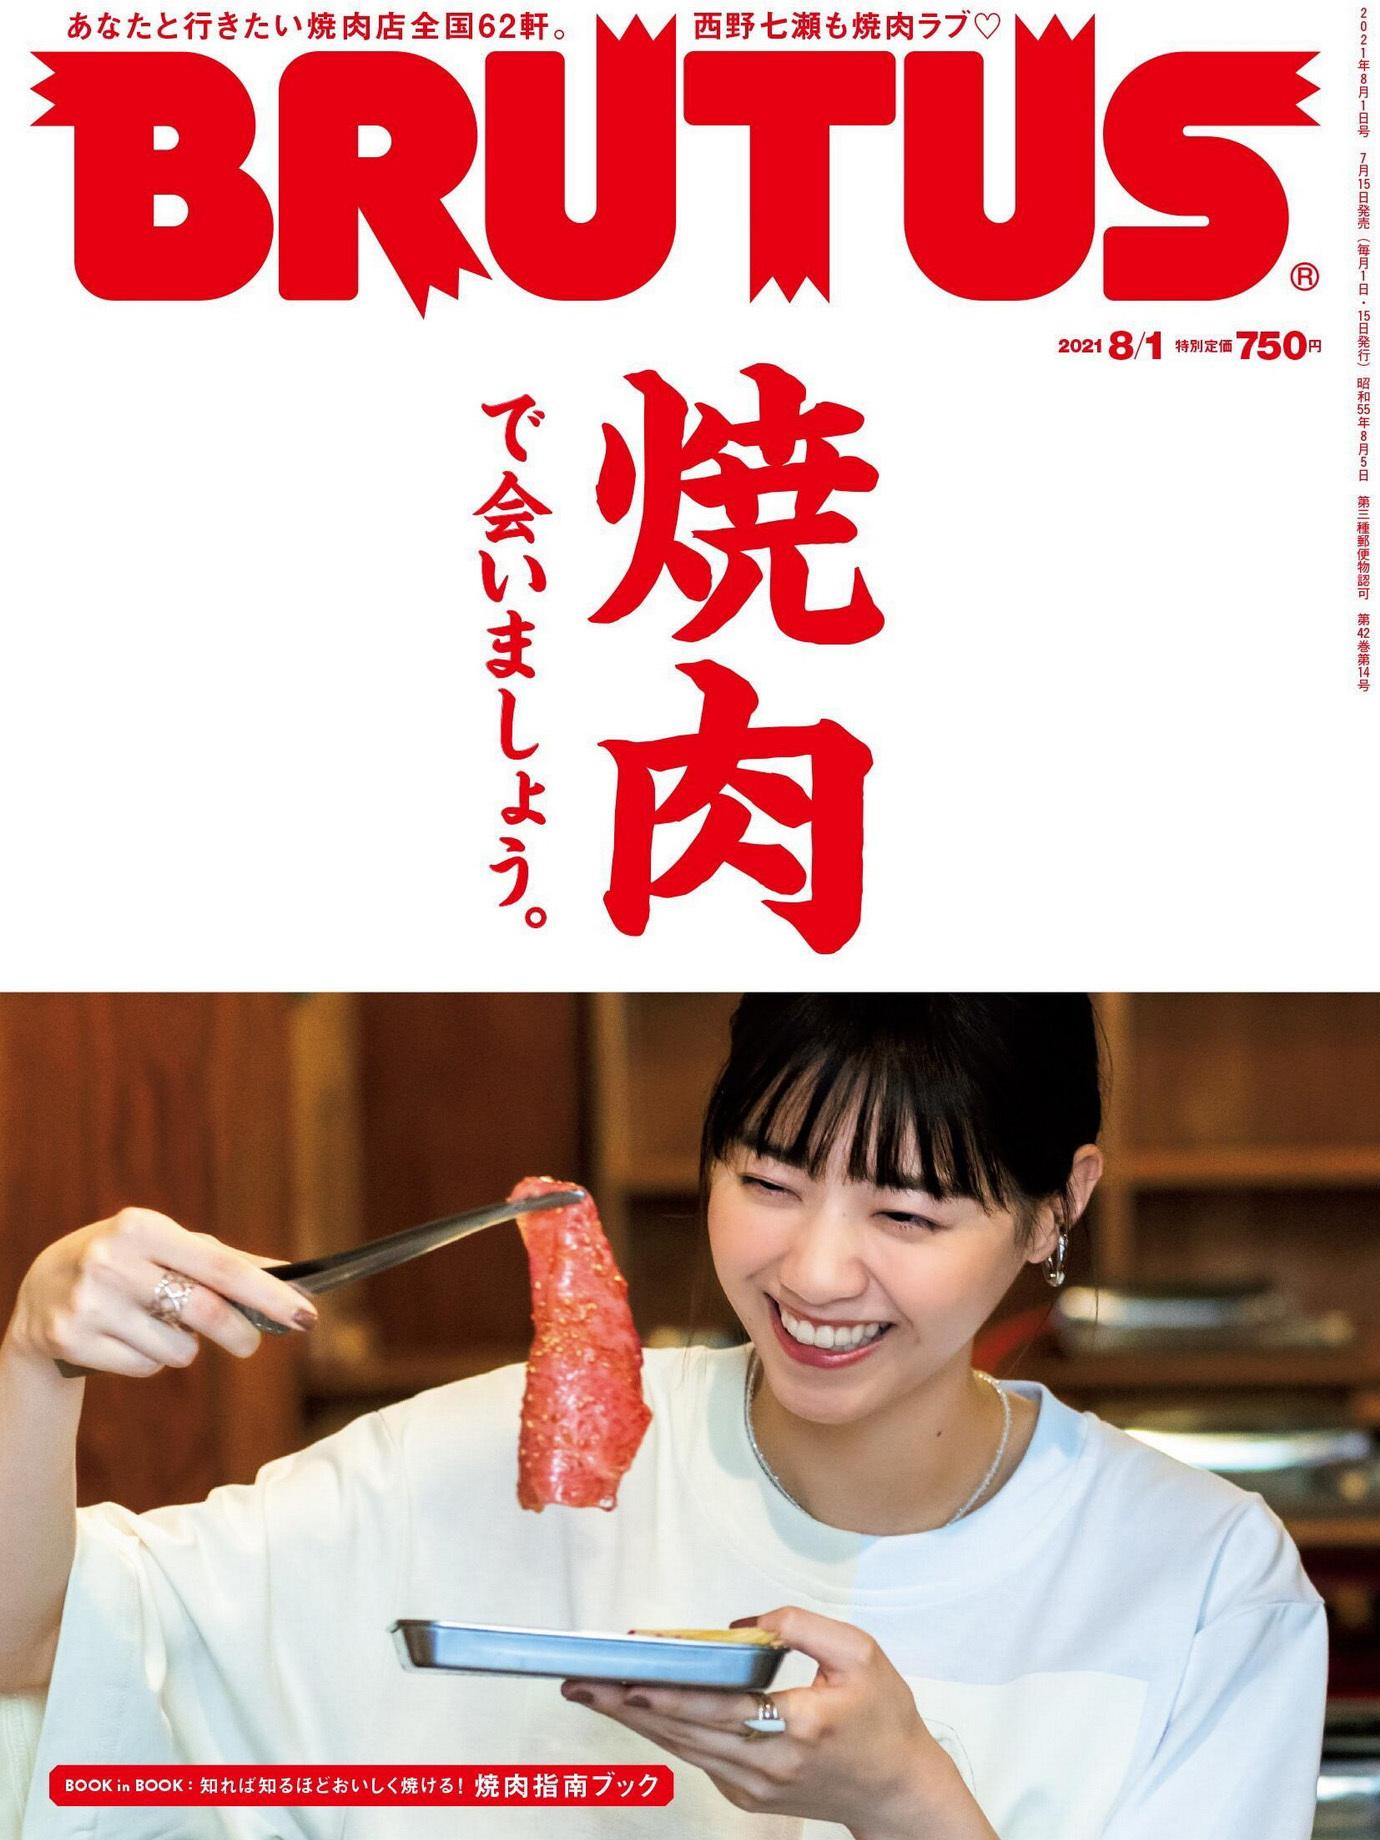 《Brutus》日本版时尚家居杂志2021年08月号